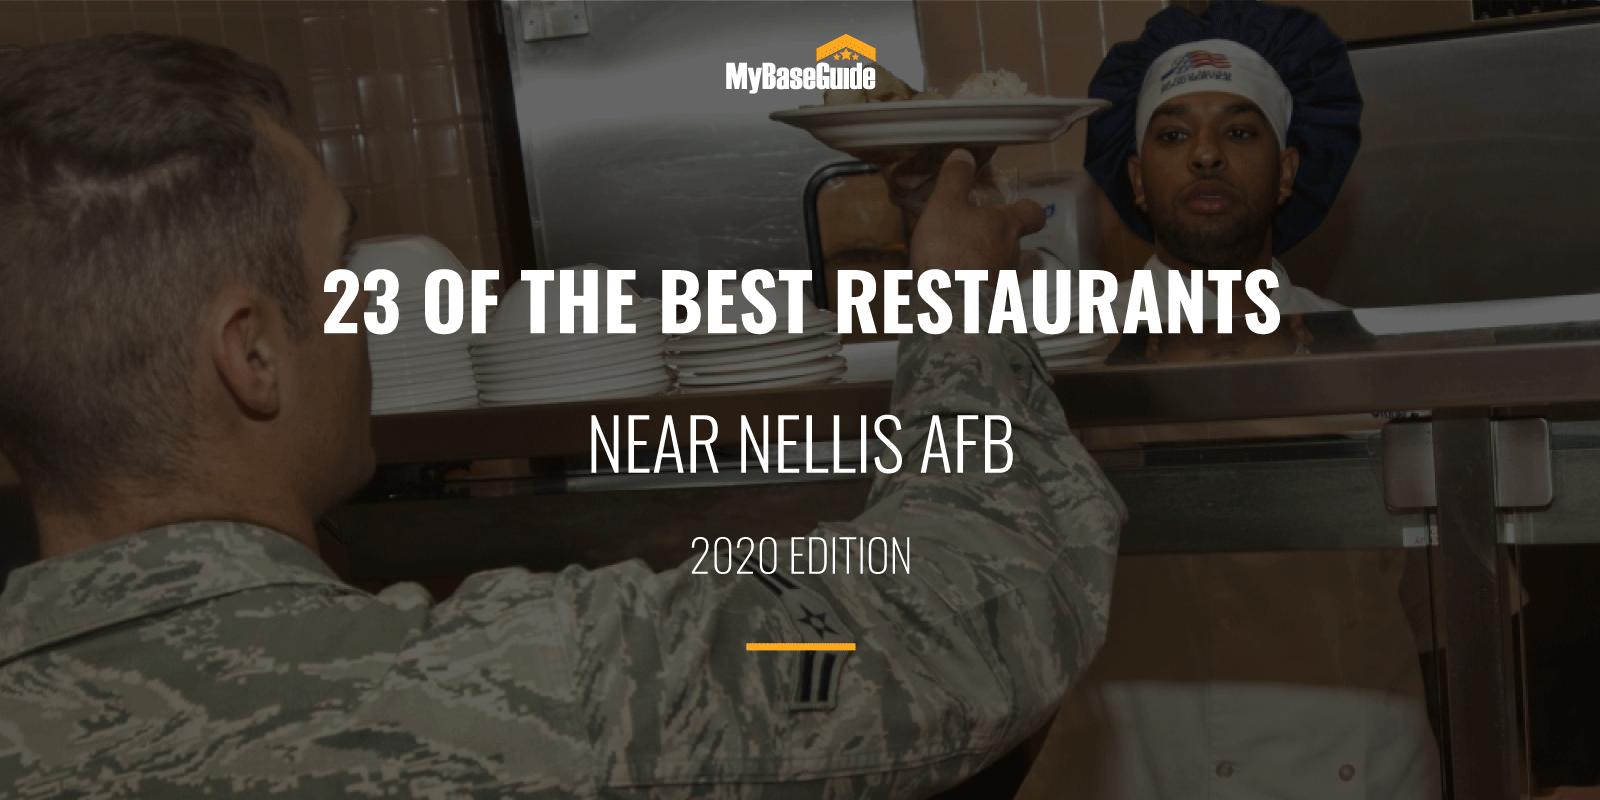 23 Of the Best Restaurants Near Nellis AFB